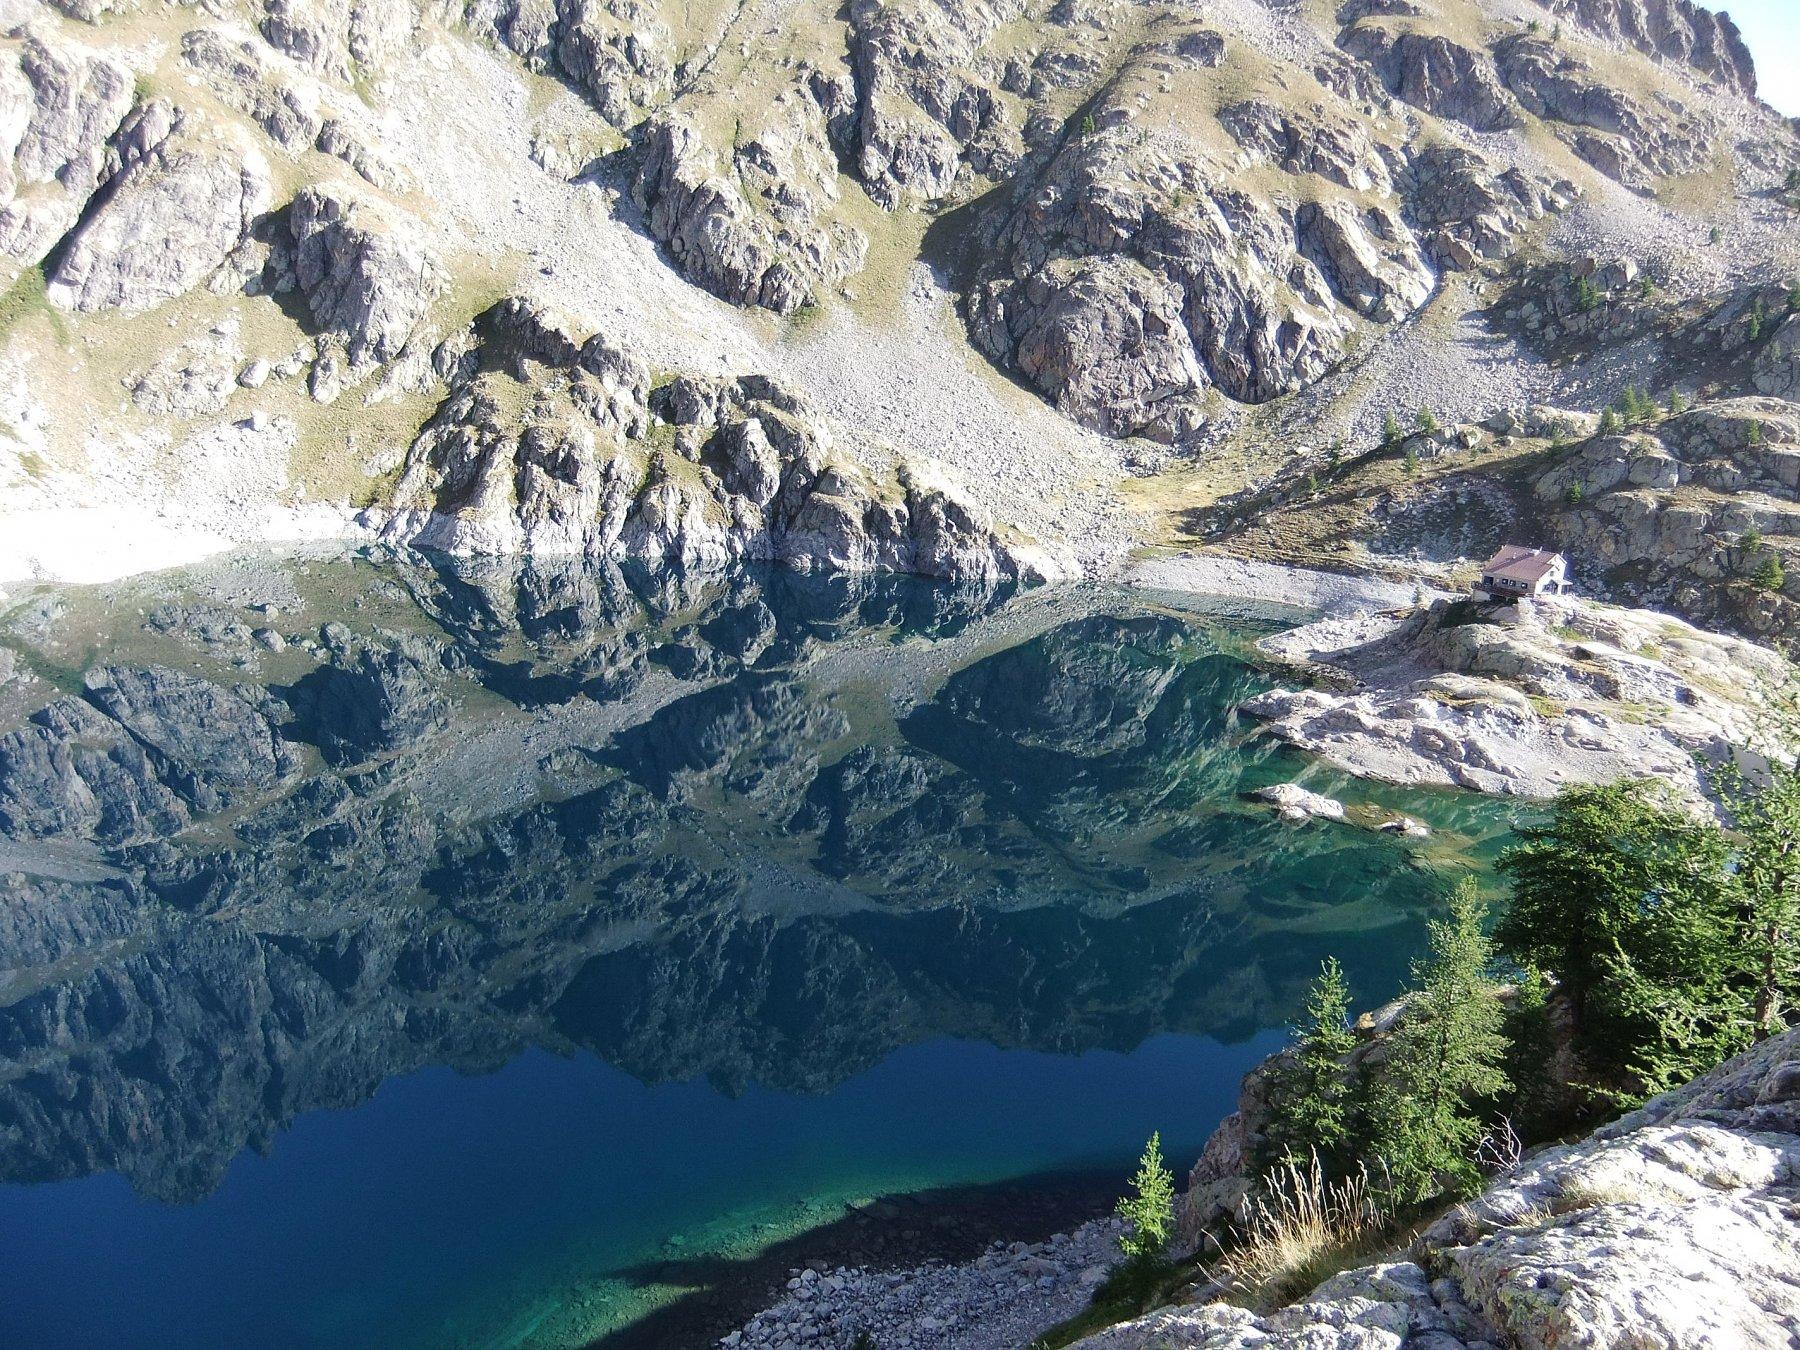 Lac Vert e rifugio Valmasque